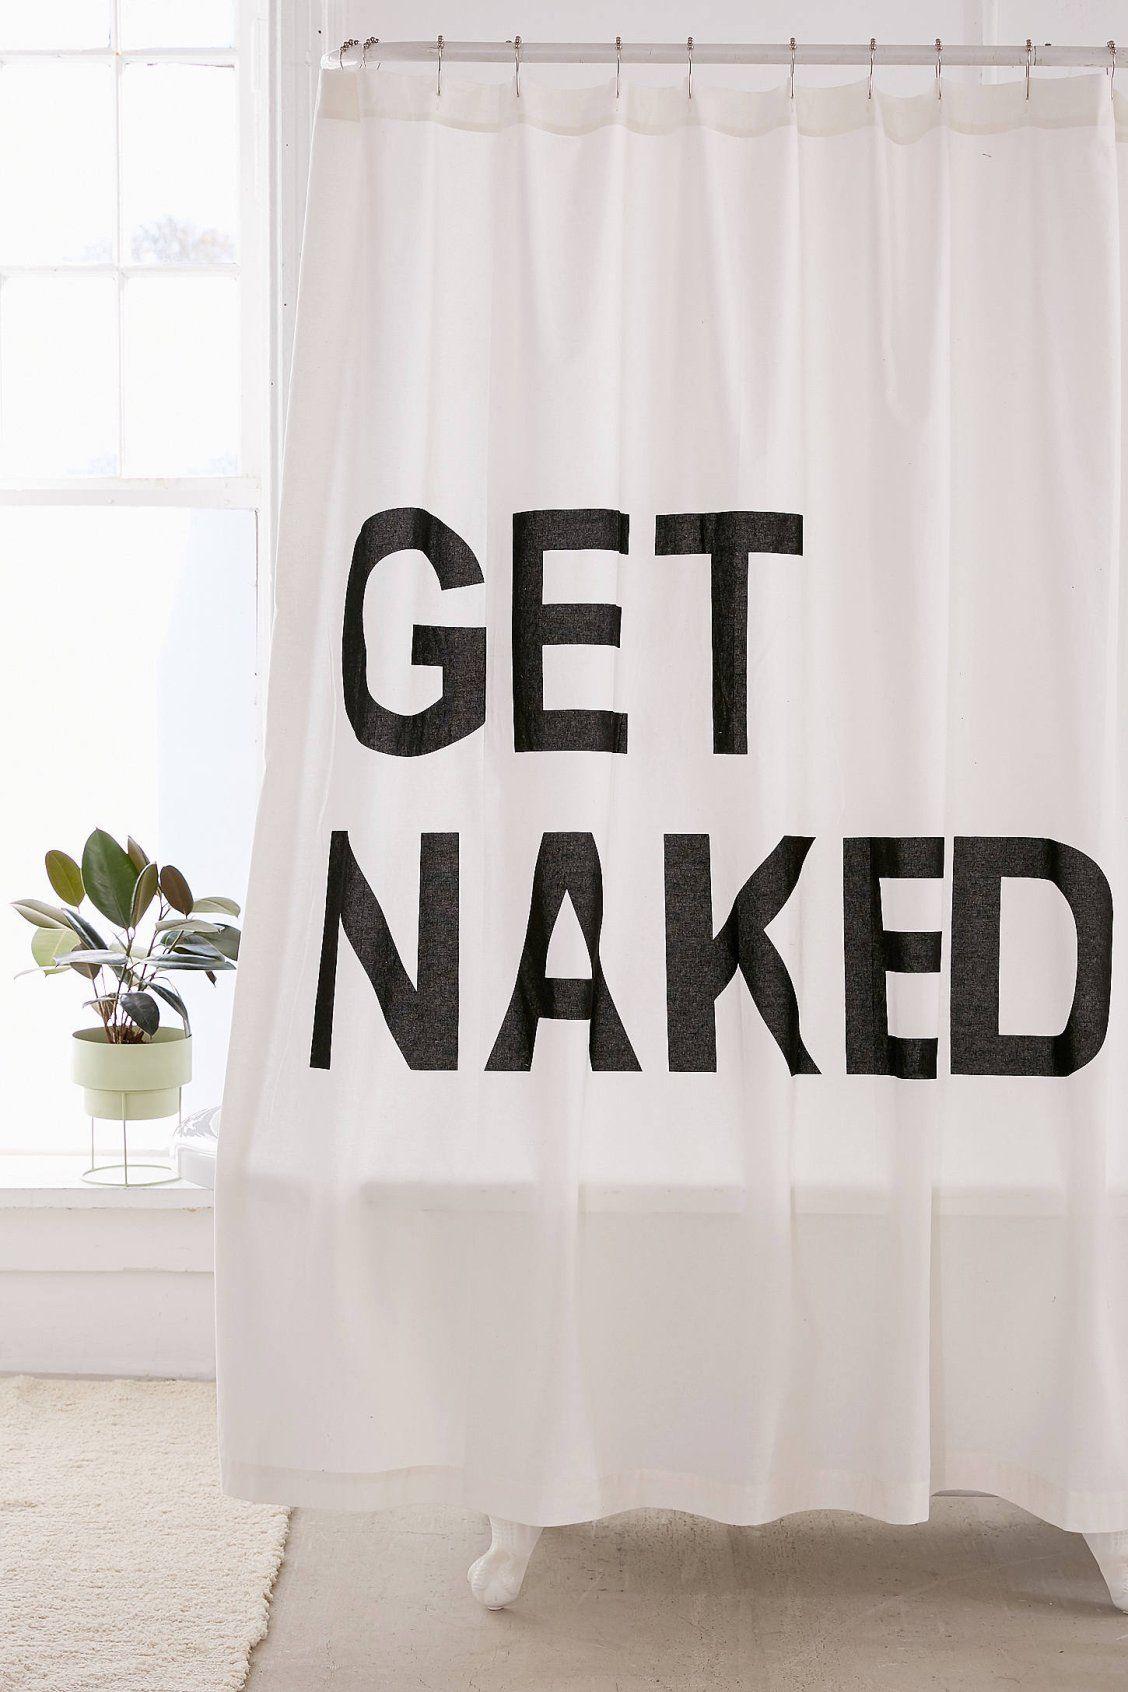 Free nude girl on girl videos